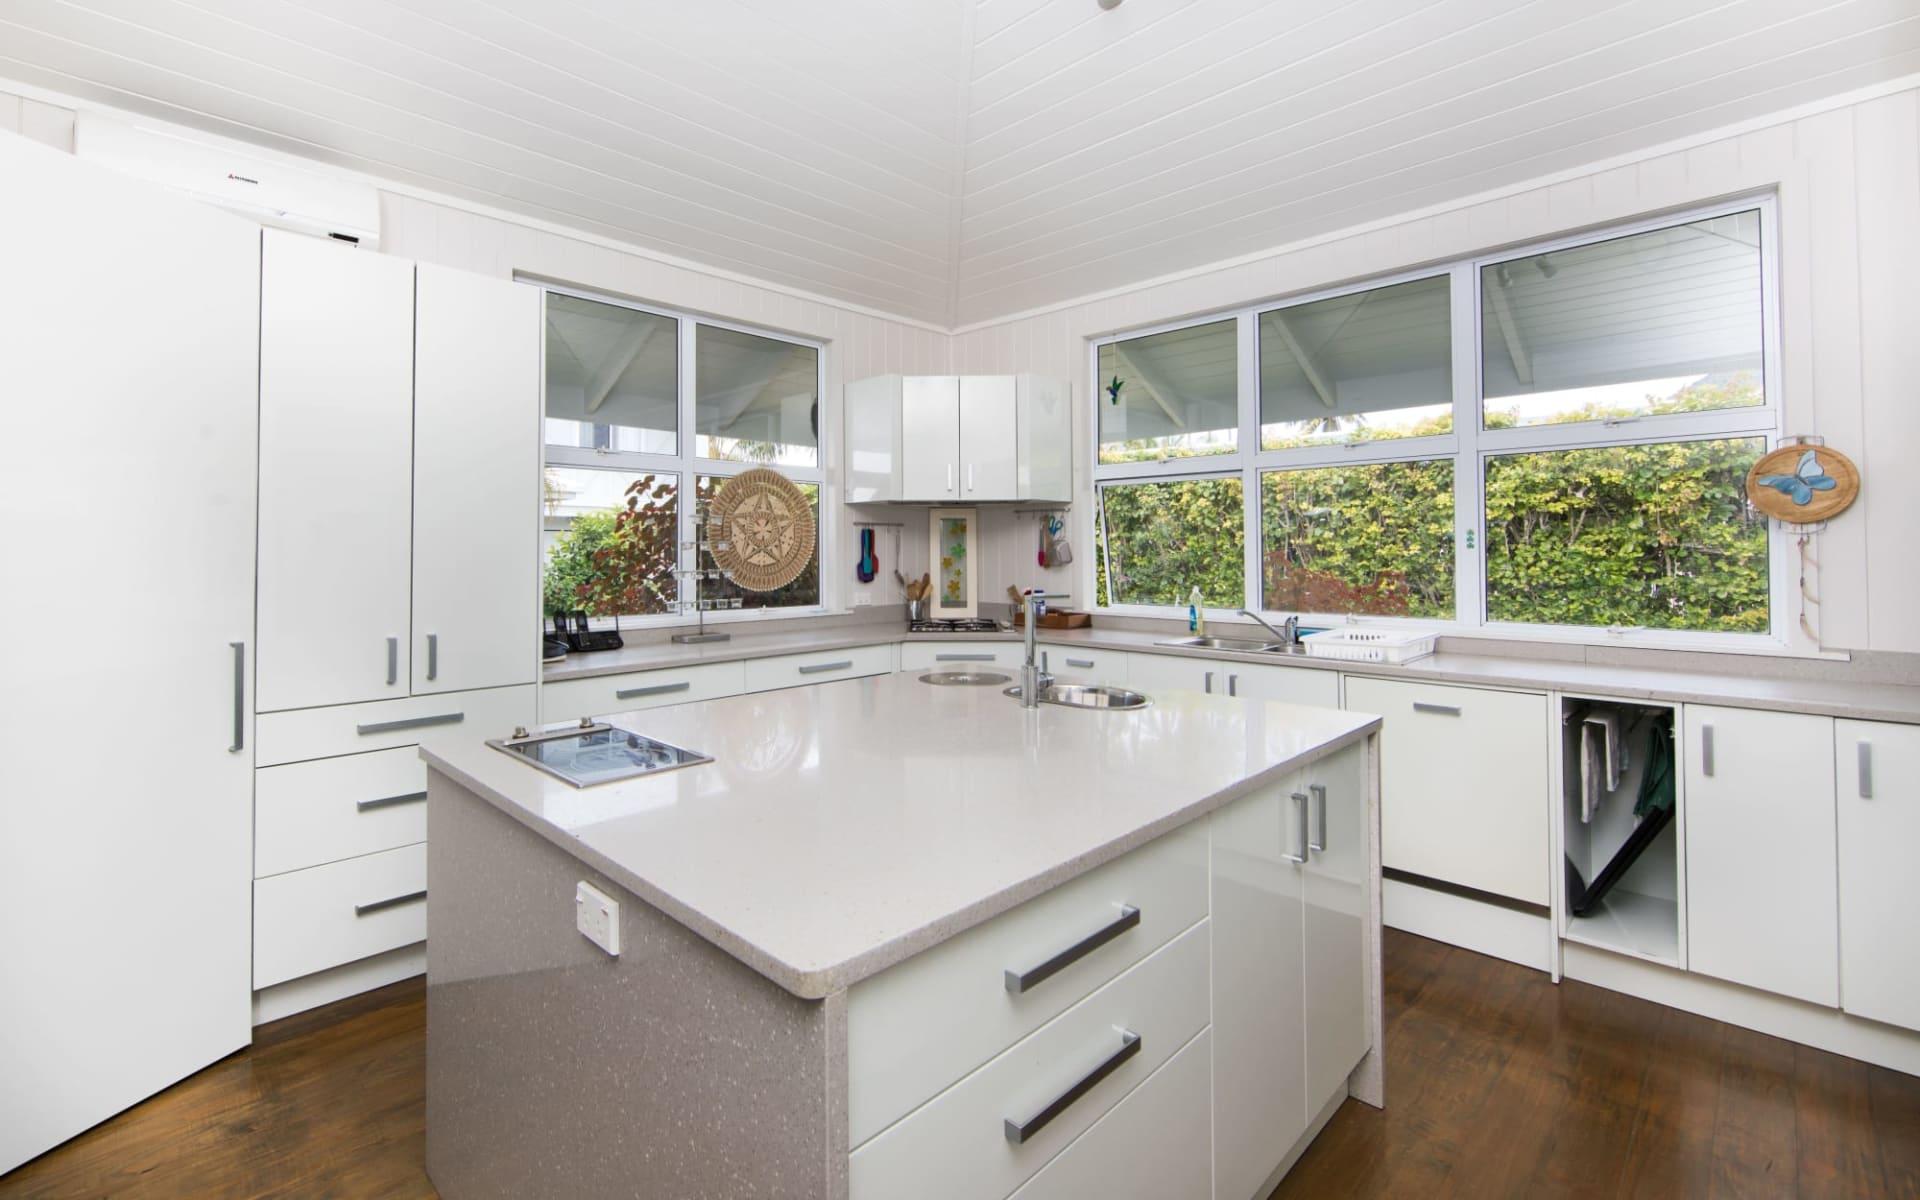 Waterfoot House in Rarotonga:  Waterfoot-House-Kitchen